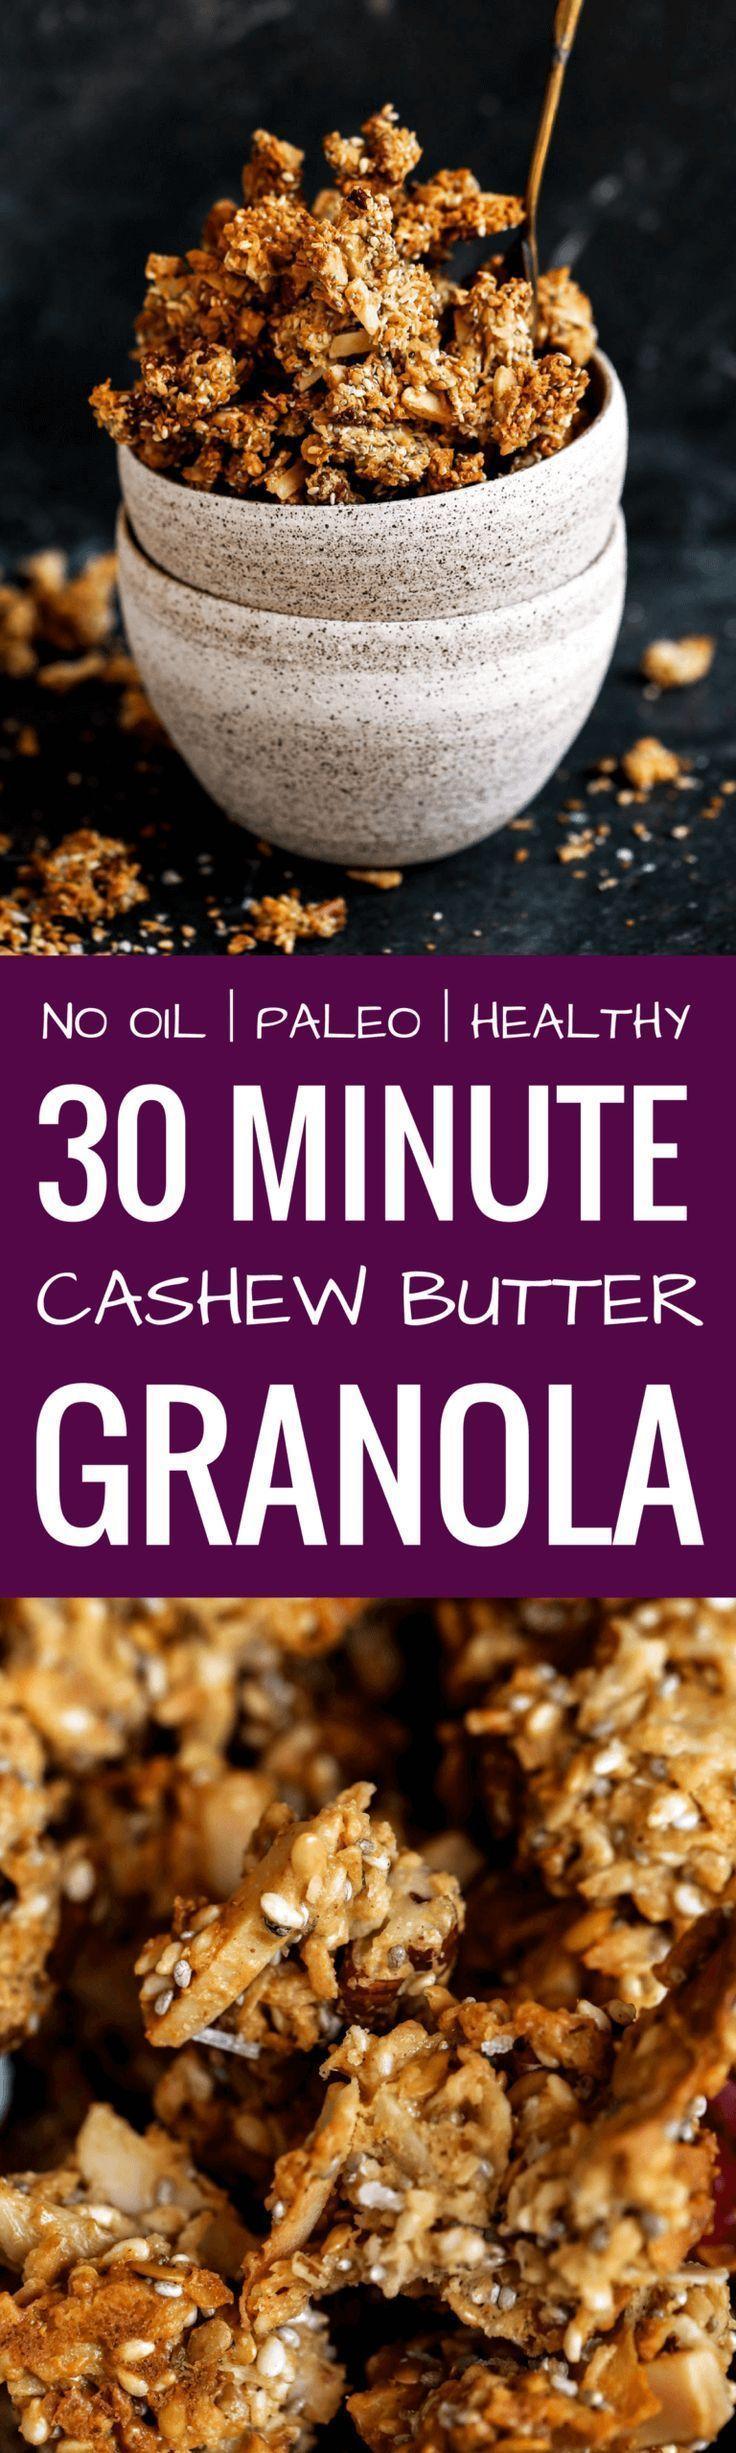 Sea Salt Cashew Butter Paleo Granola | Recipe | Paleo ...